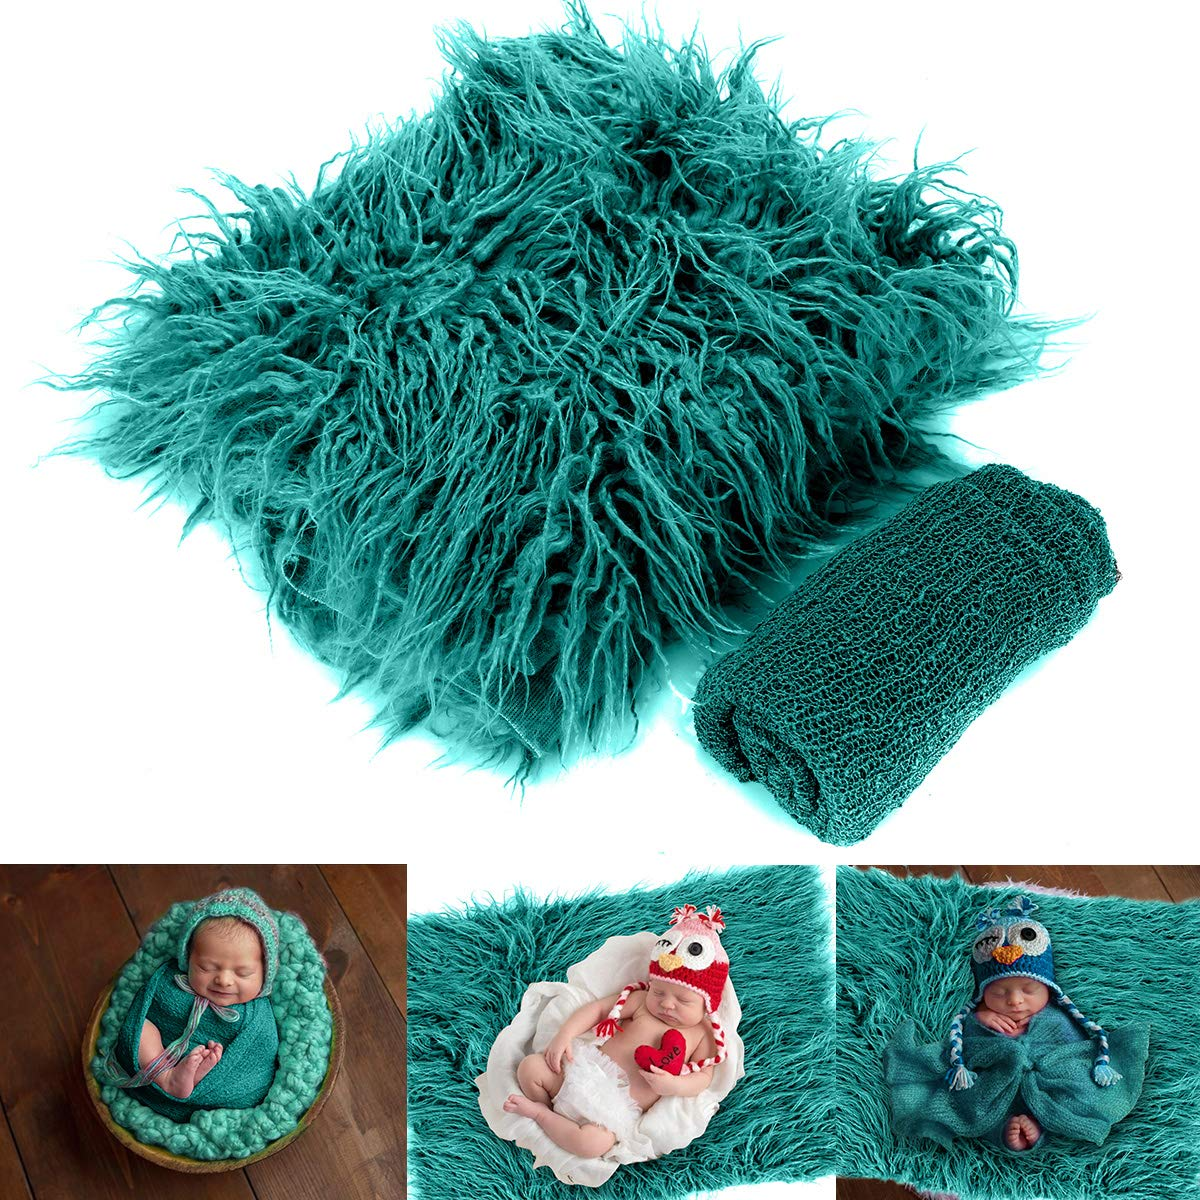 Yinuoday 2PCS Newborn Baby Photography Props DIY Newborn Wraps Photography Mat Blanket for Baby Boys and Girls